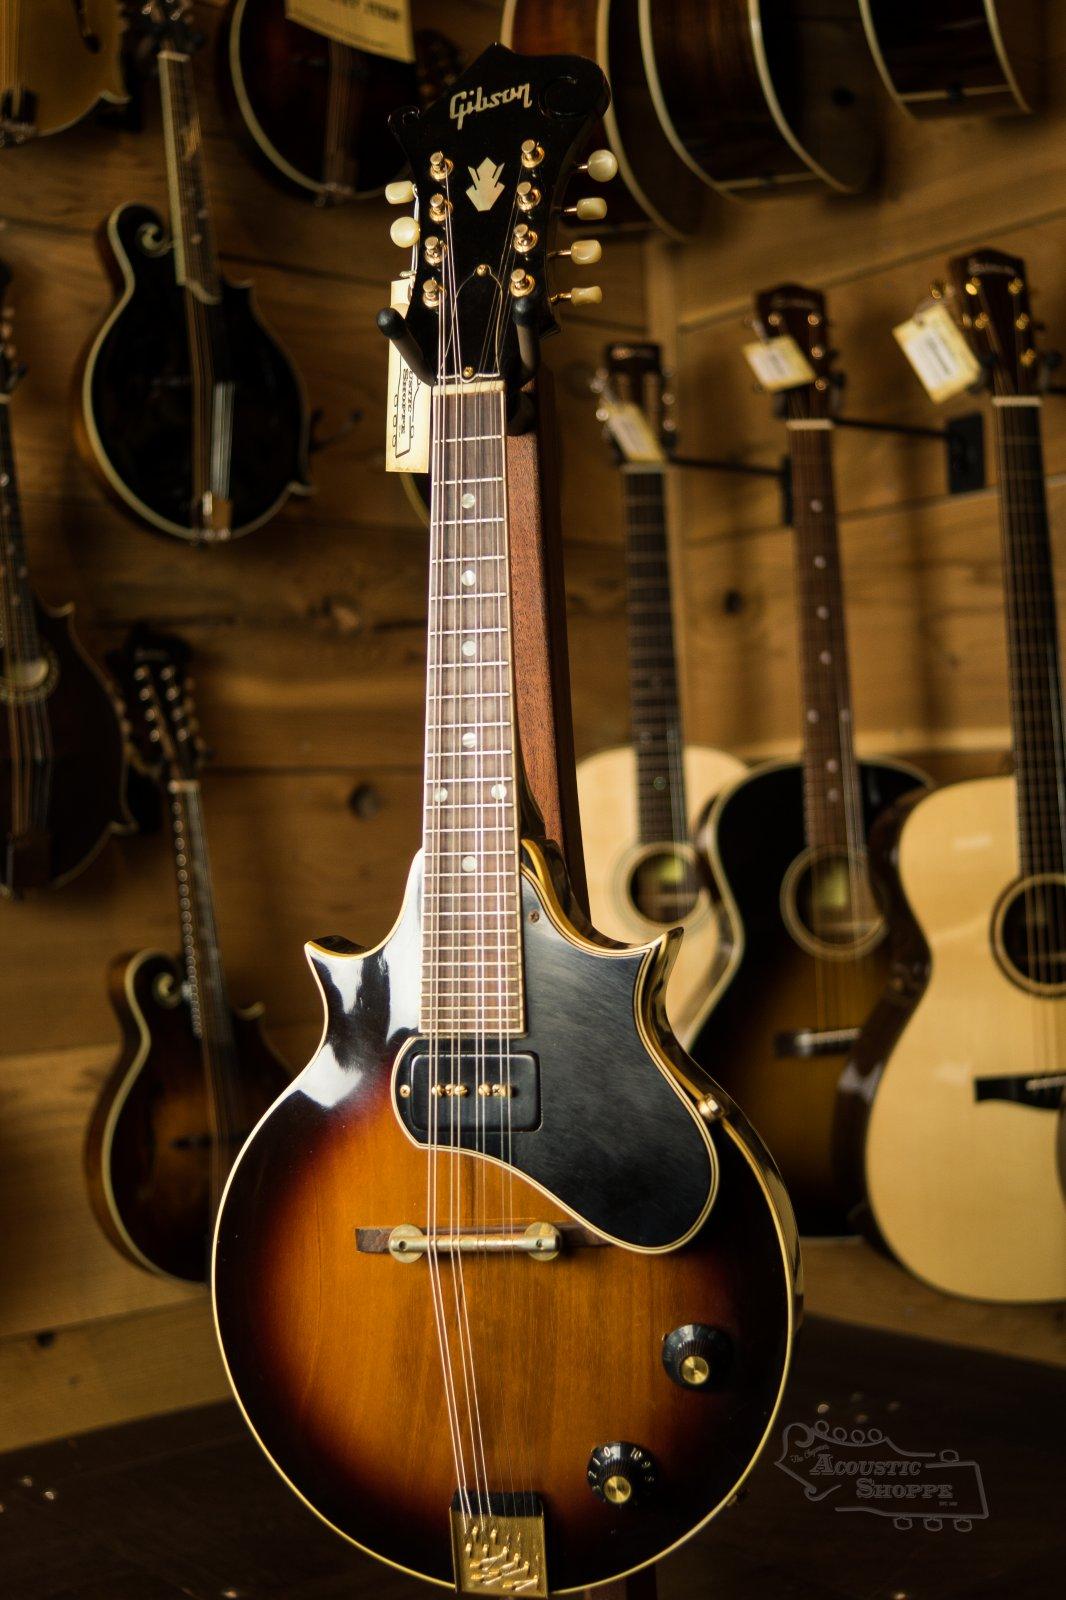 (Vintage) 1968 Gibson EM-200 Solid Body Electric Mandolin